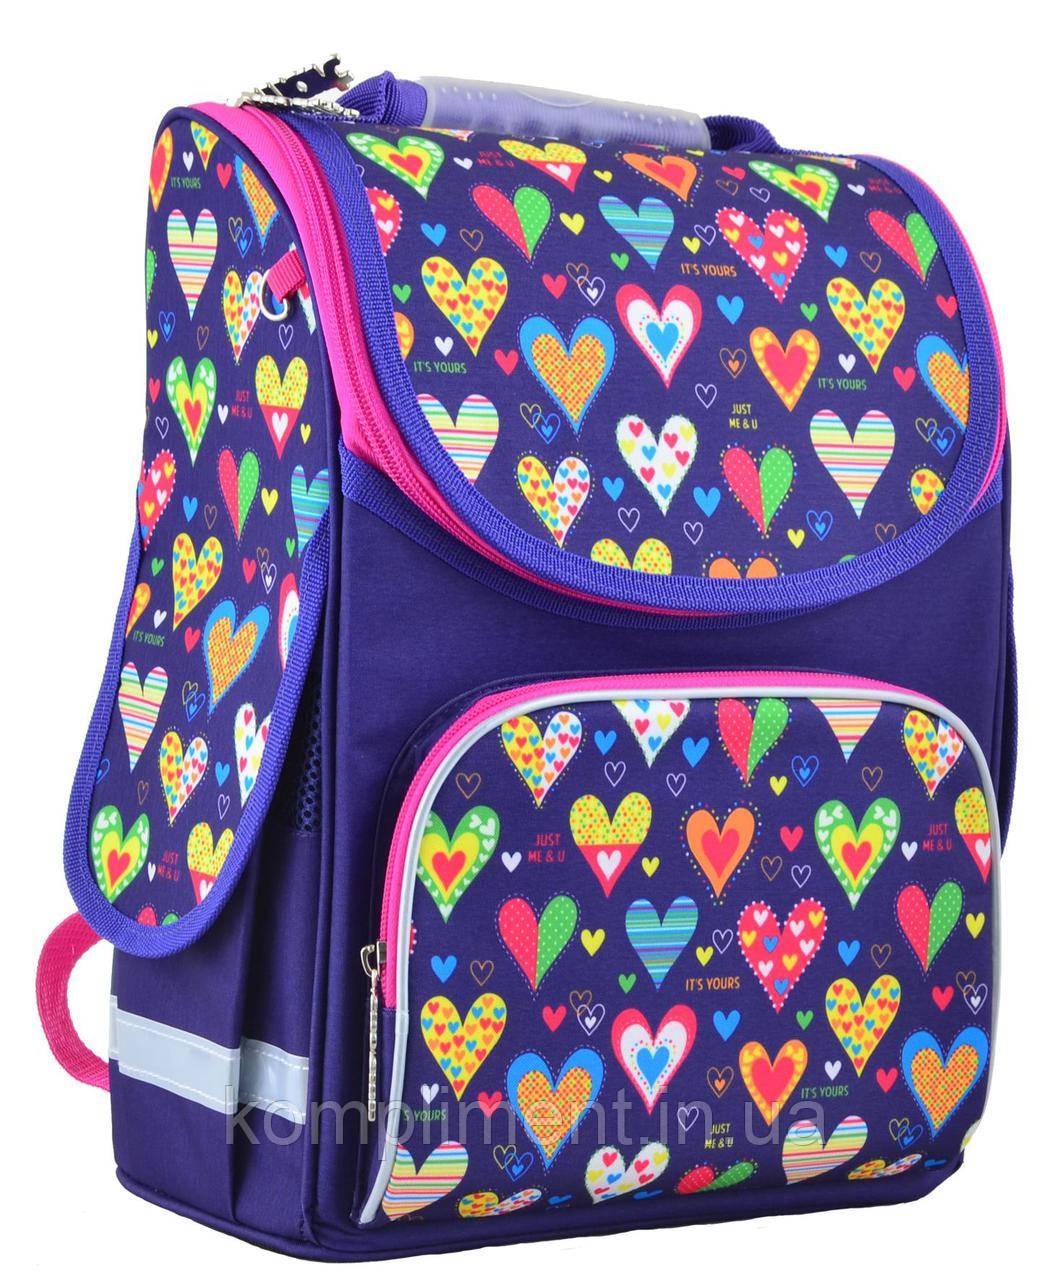 Рюкзак каркасный  PG-11 Hearts blue, 31*26*14 , SMART